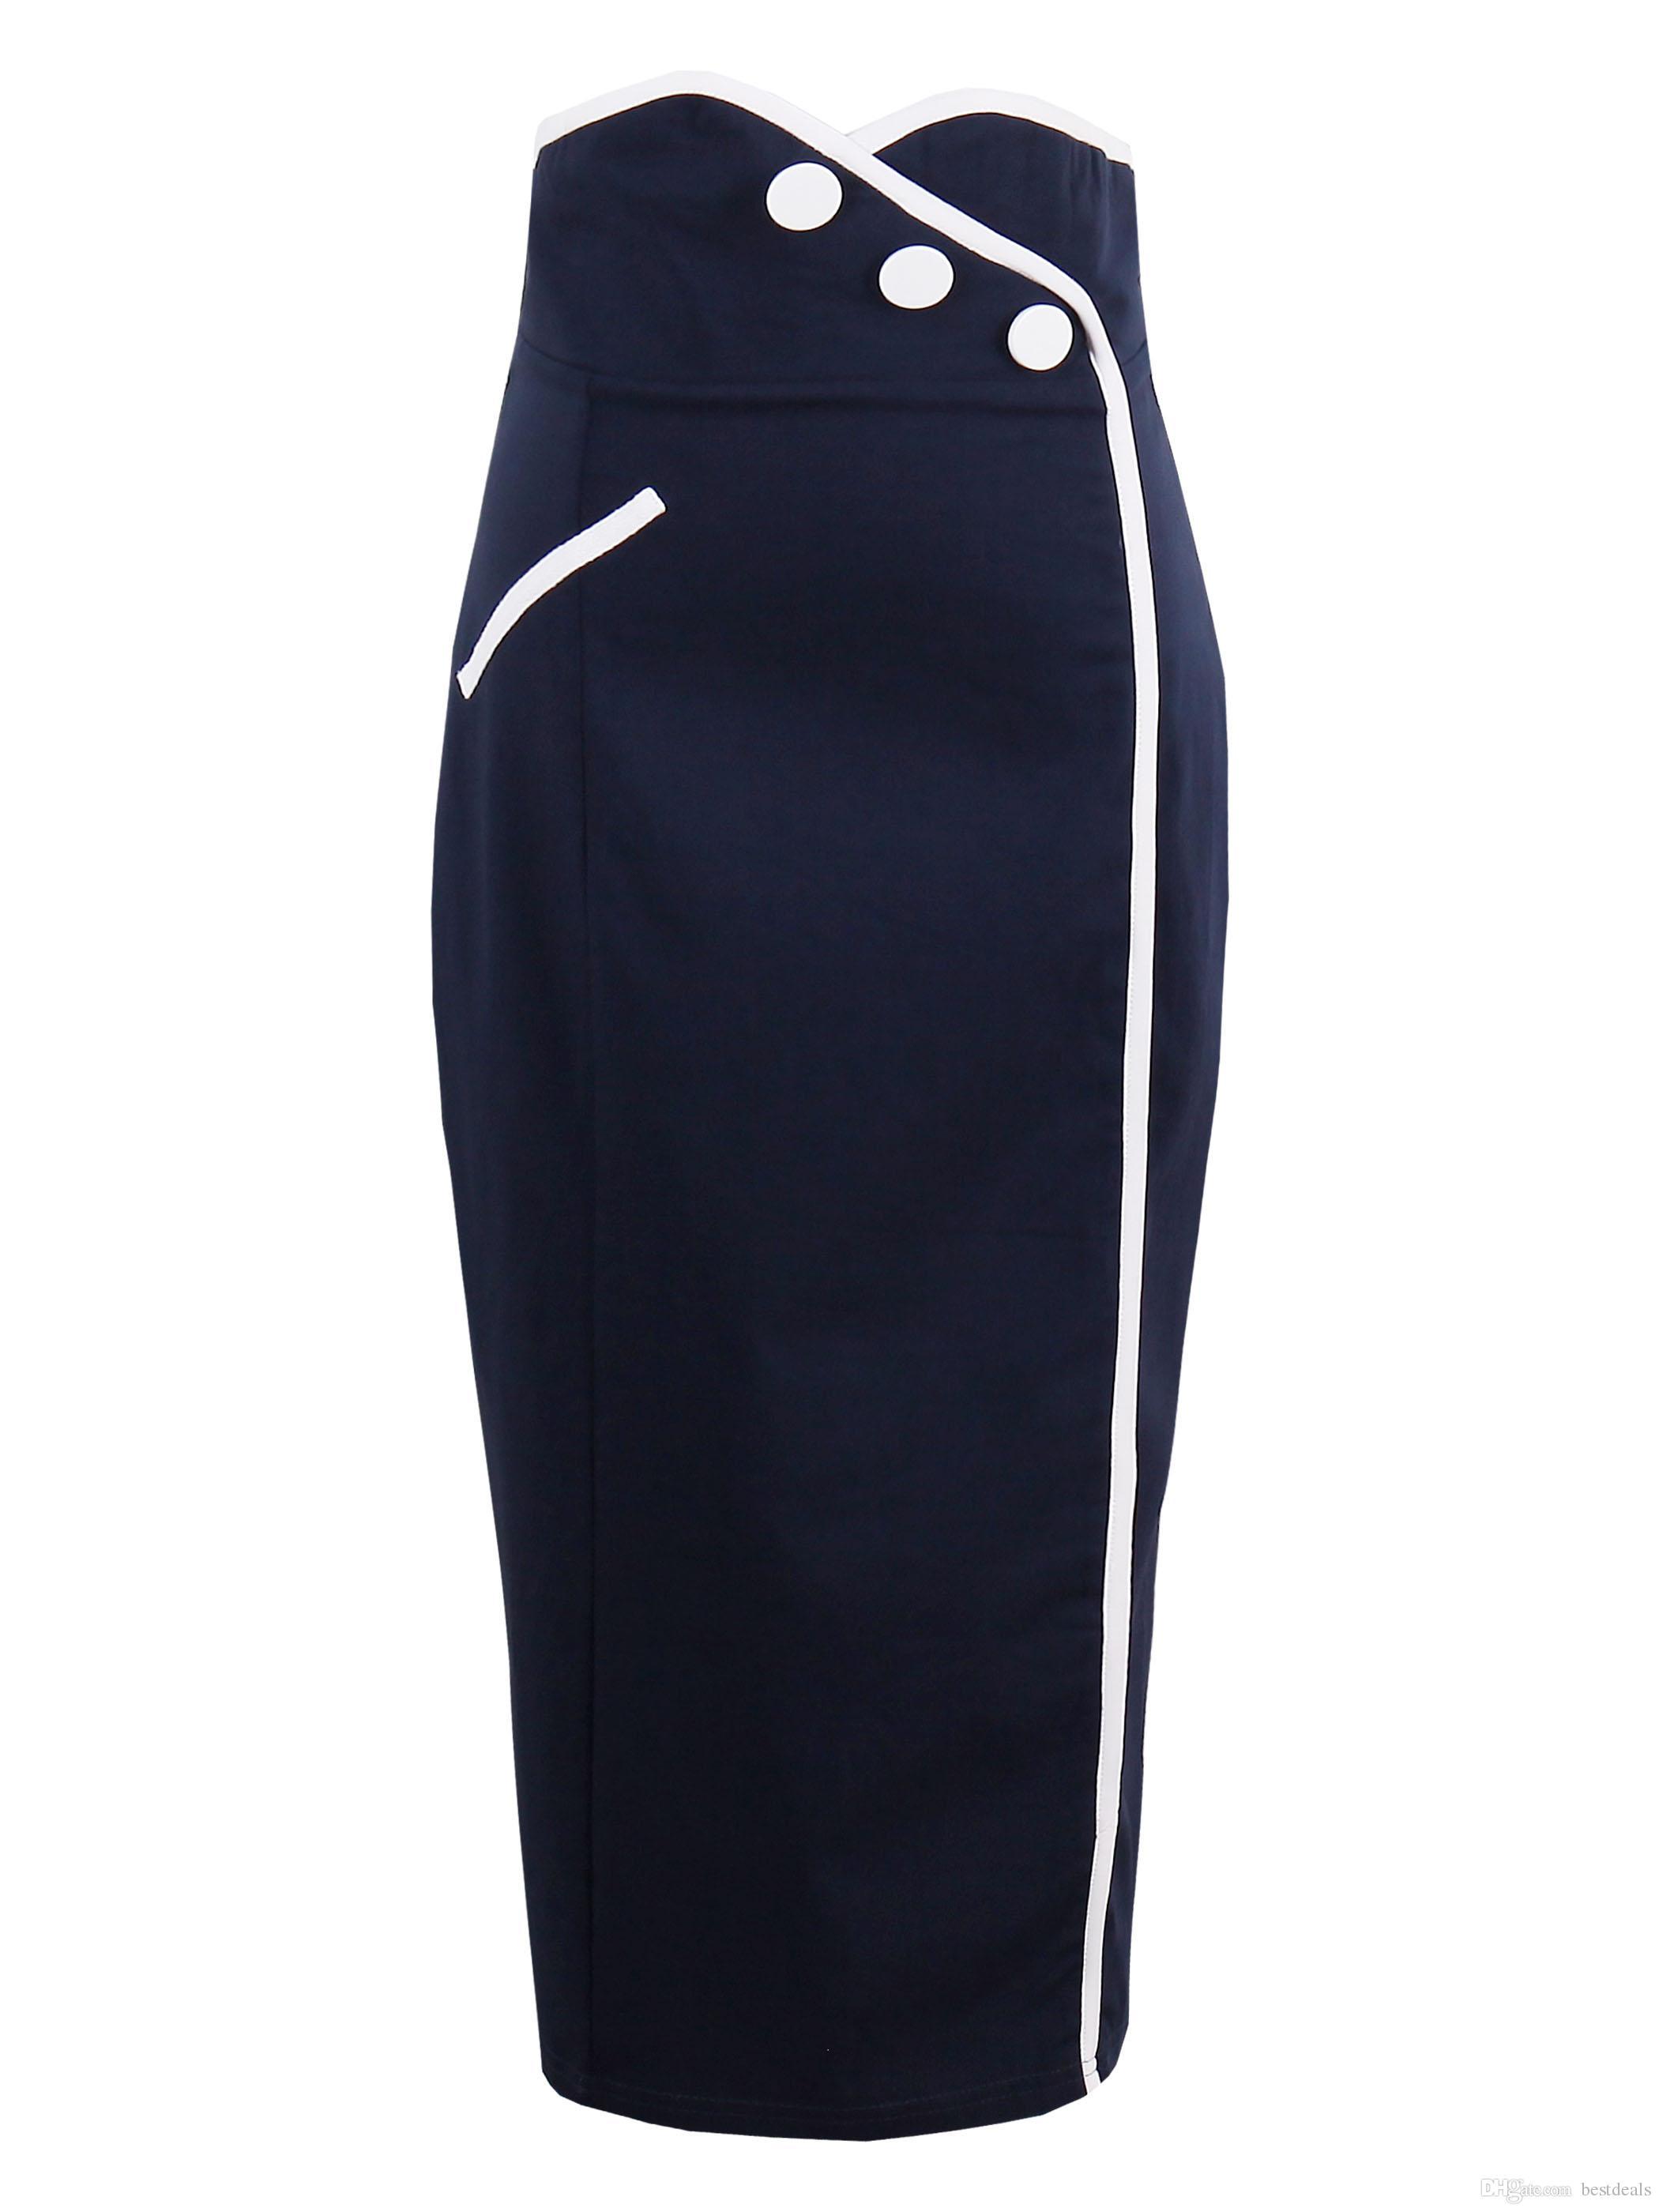 901be9bfe4a Compre Elegante 2018 Mujeres Falda Azul Marino Falda Midi Slim OL Sexy  Botón Falda Lápiz Delgado S 2XL FS5002 A $19.88 Del Bestdeals | DHgate.Com